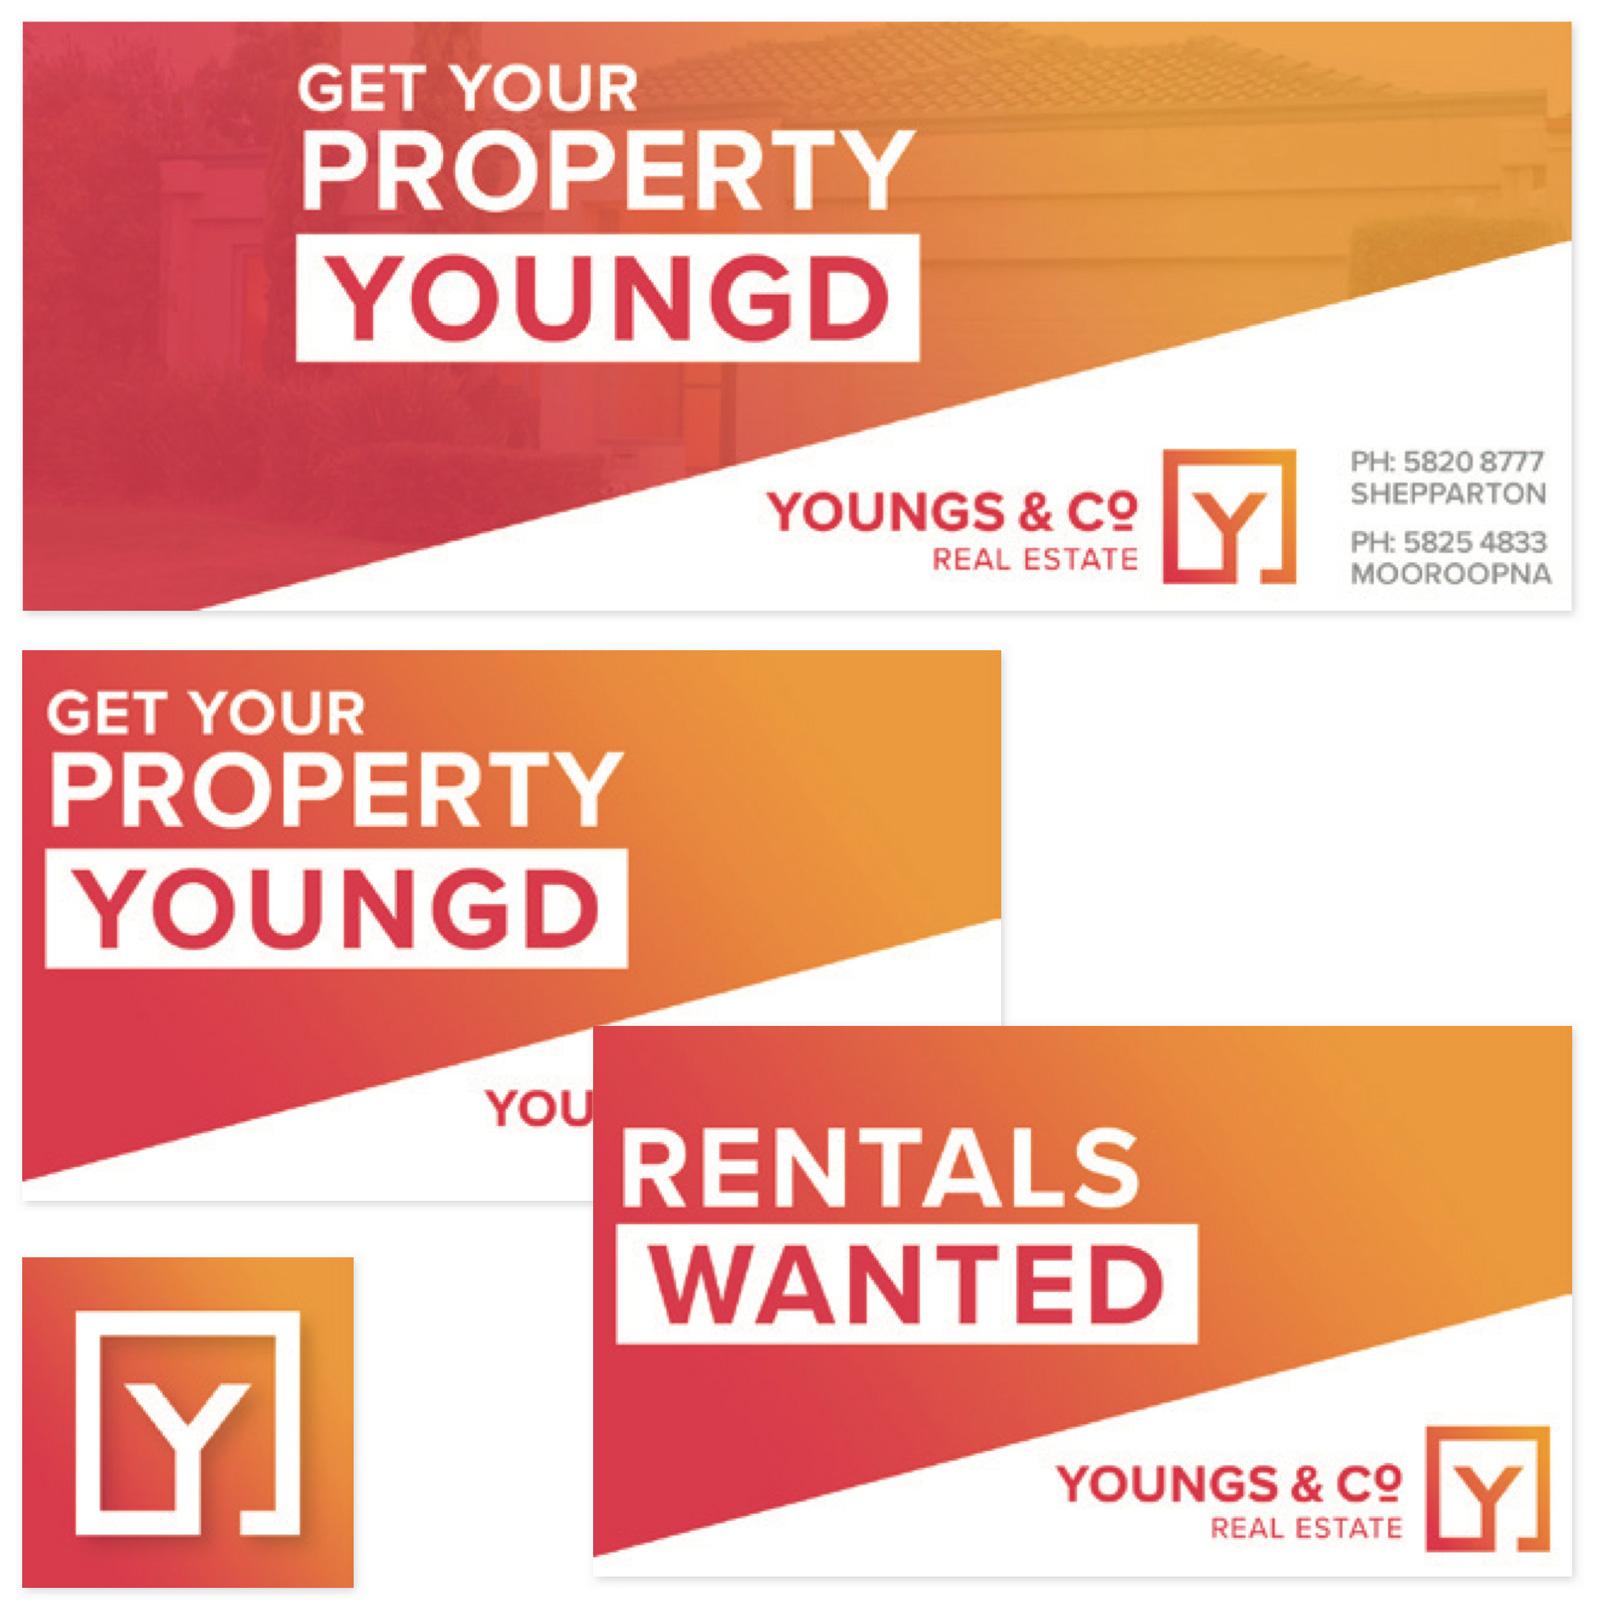 Youngs-&-Co-SOCIAL-MEDIA.jpg